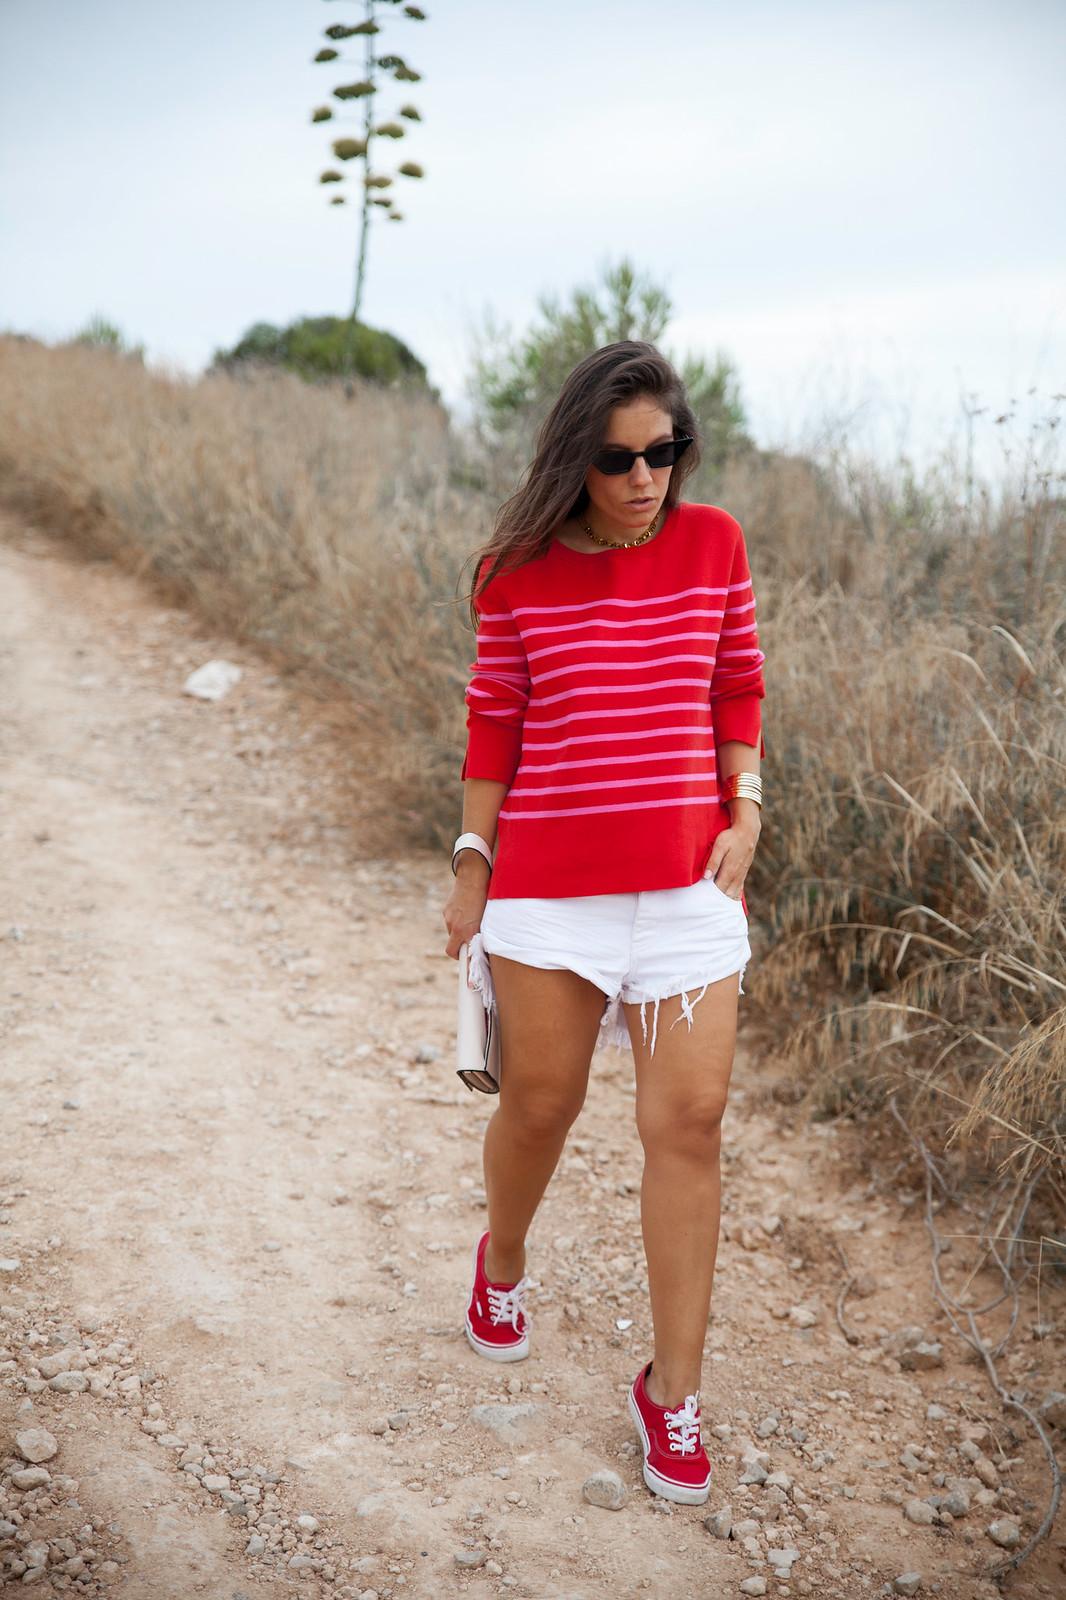 04_outfit_emabarazada_5_meses_jersey_parfois_rojo_rayas_rosas_shorts_oneteaspoon_blanco_theguestgirl